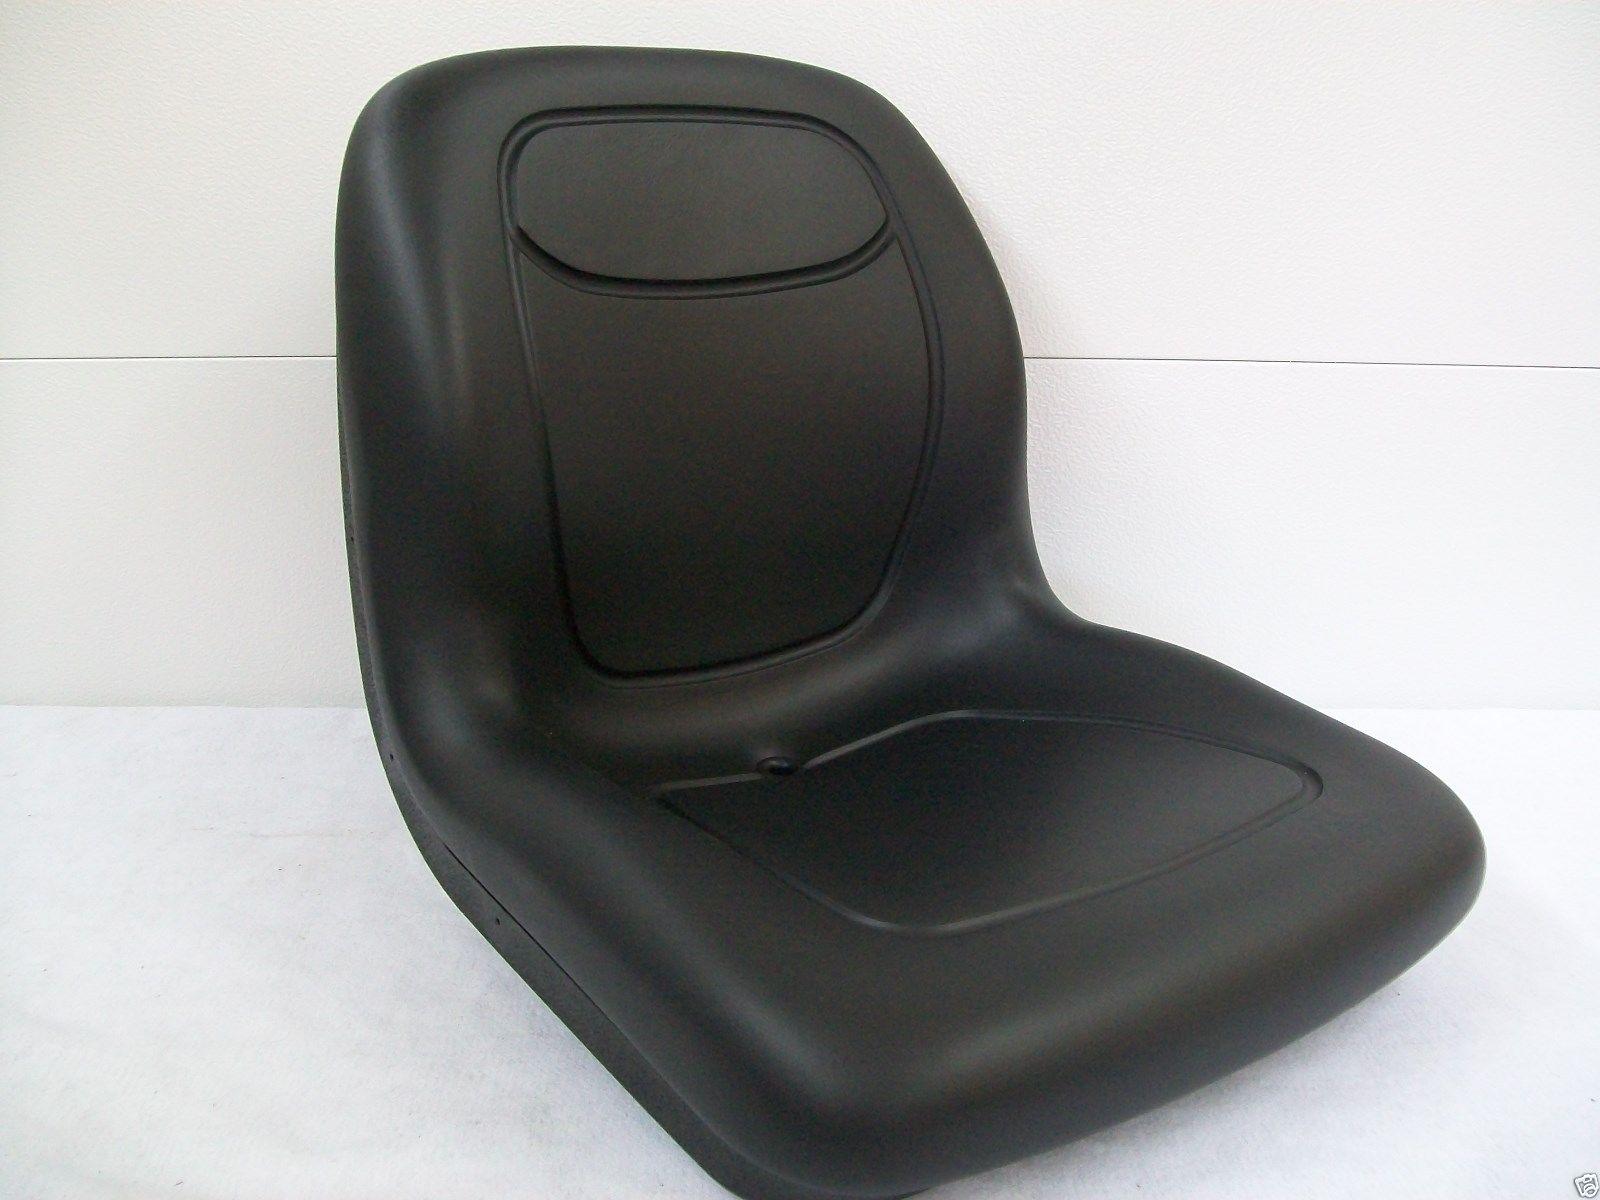 seat fits kubota bx1500 bx1800 bx2200 bx2230 compact tractors seat fits kubota bx1500bx1800bx2200bx2230 compact tractors bx22 backhoe